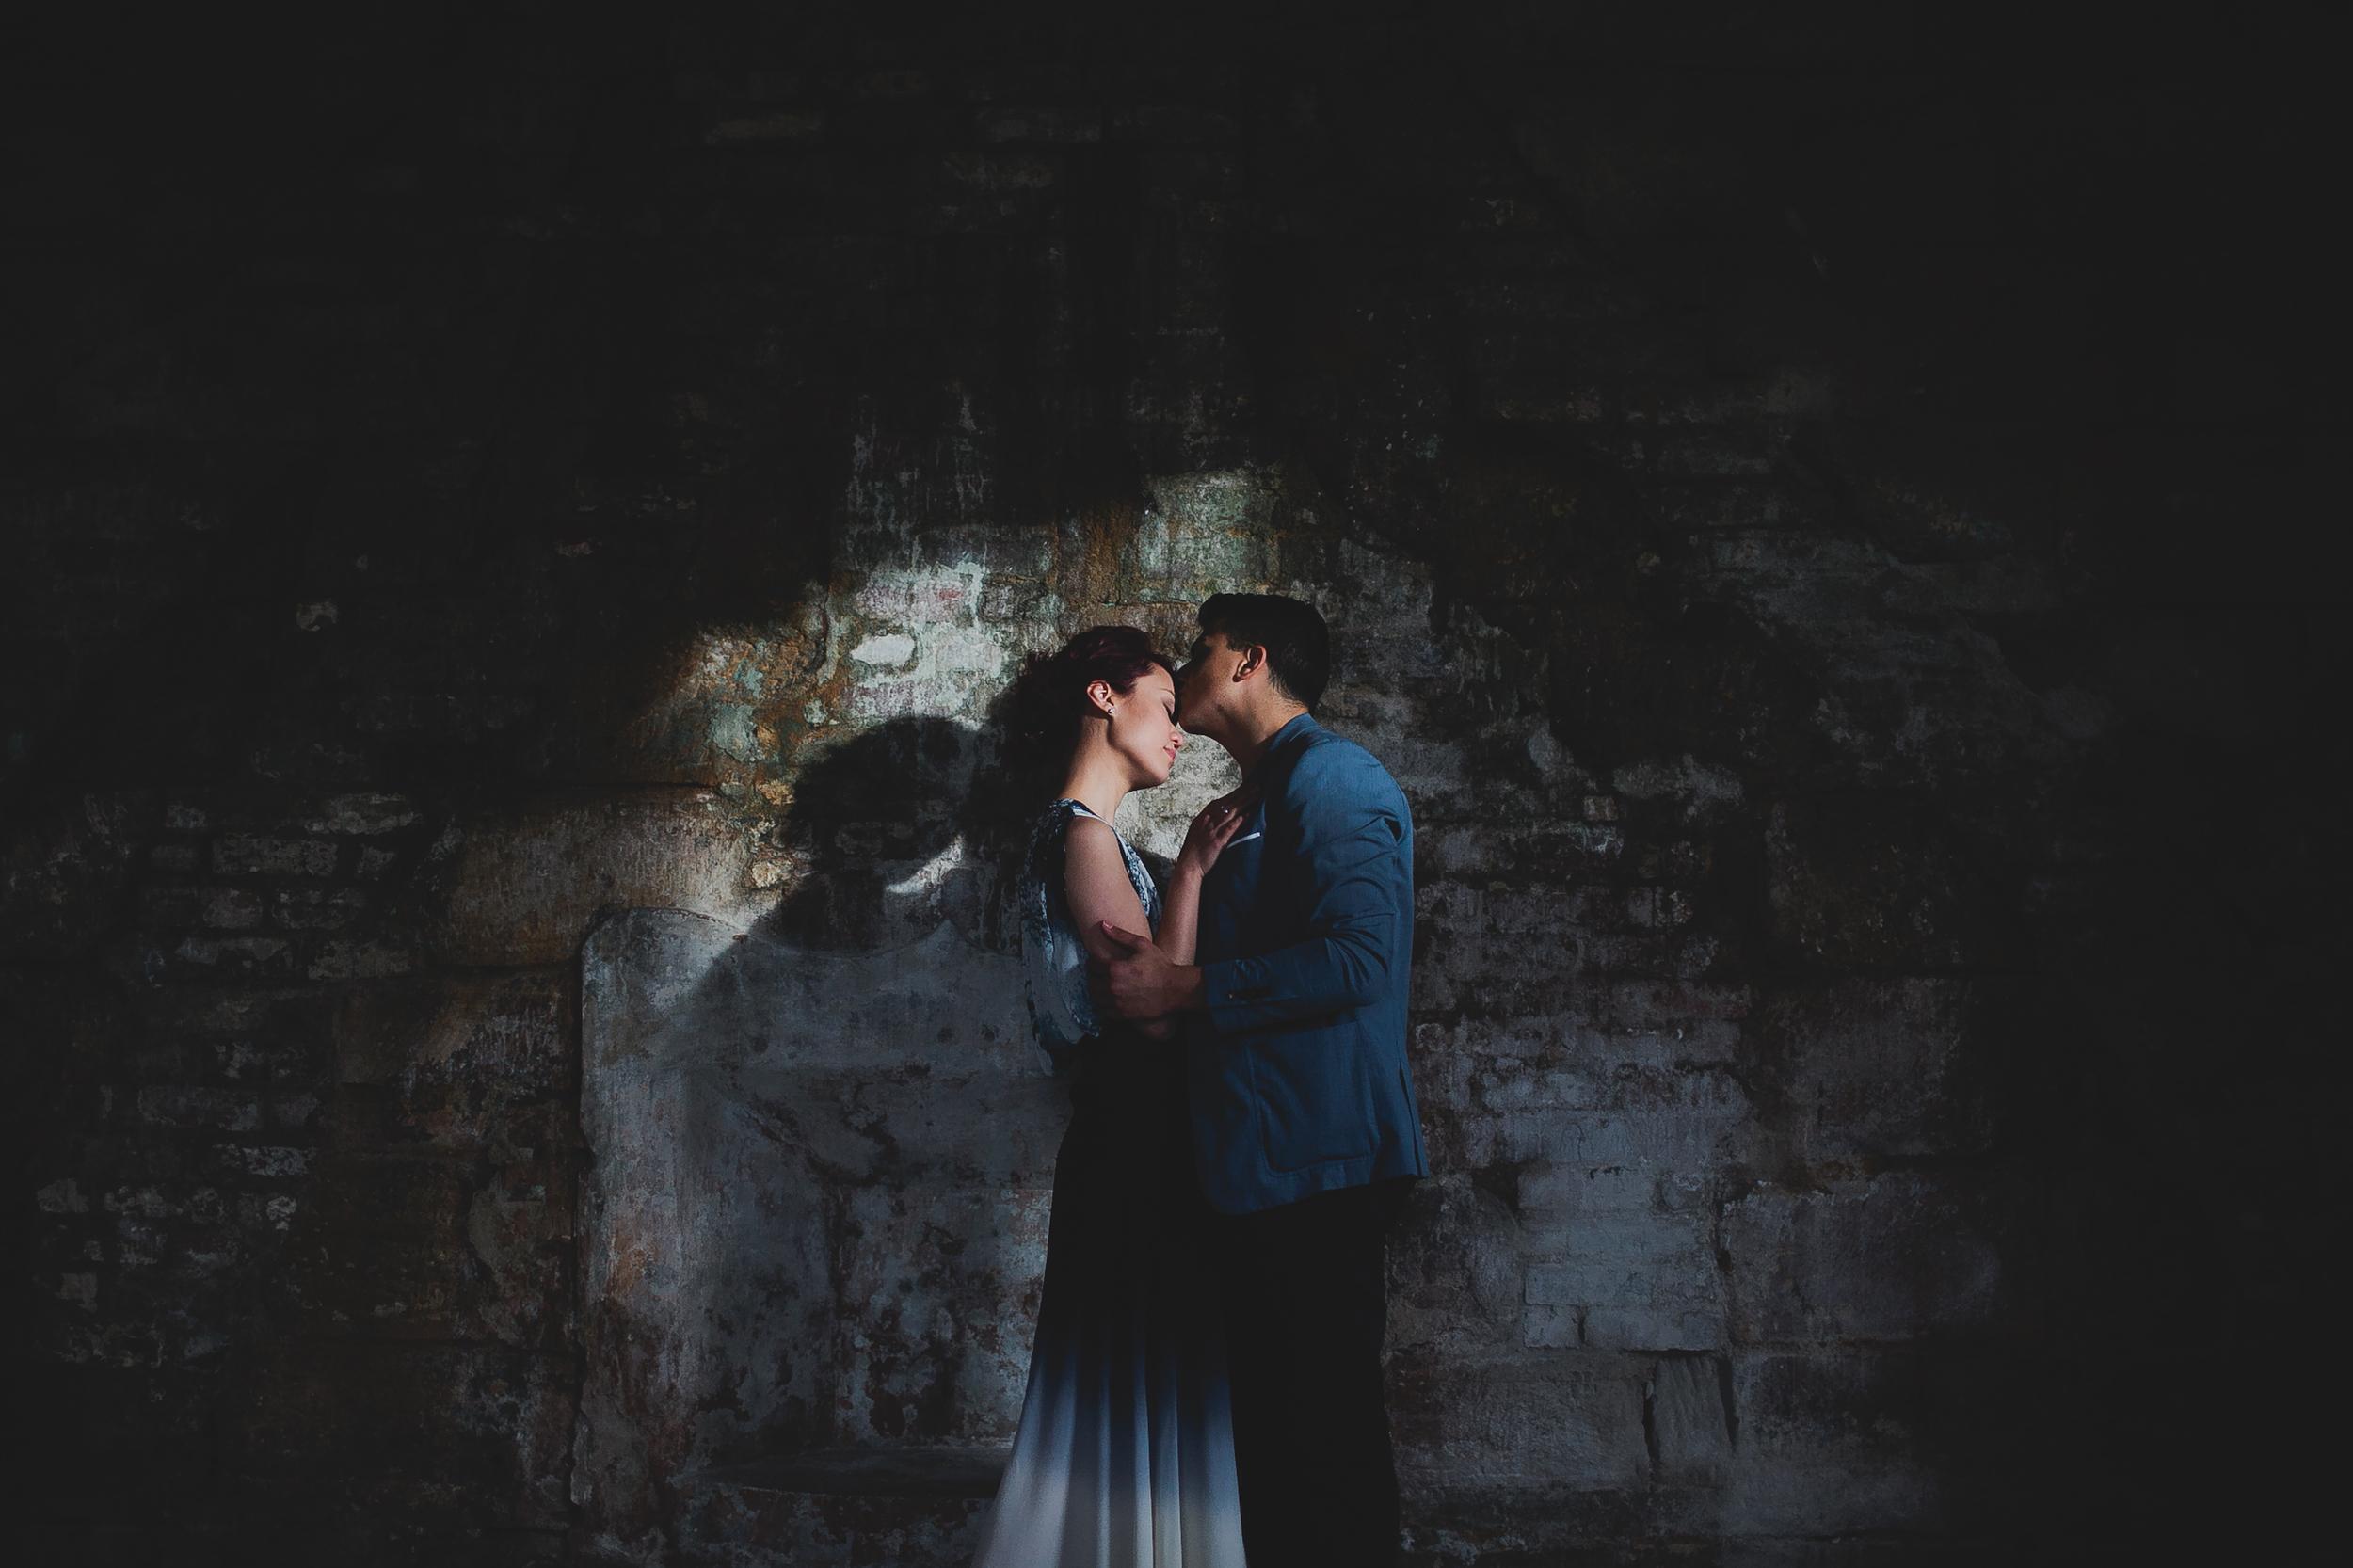 203_Nikki+Thomas_Engaged.jpg